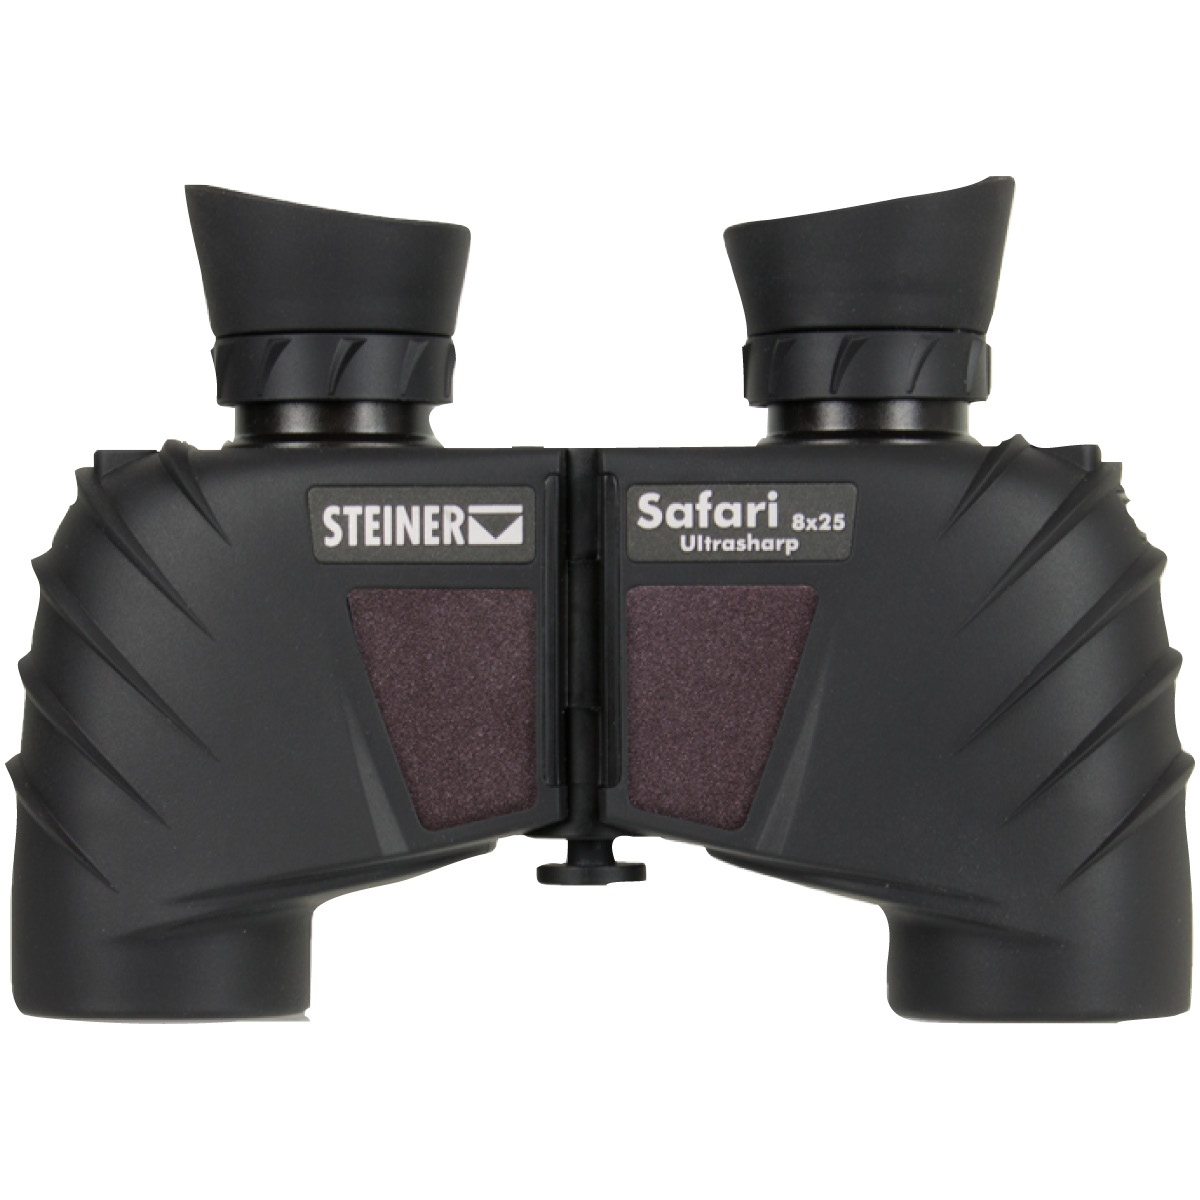 Steiner 8x25 Safari UltraSharp